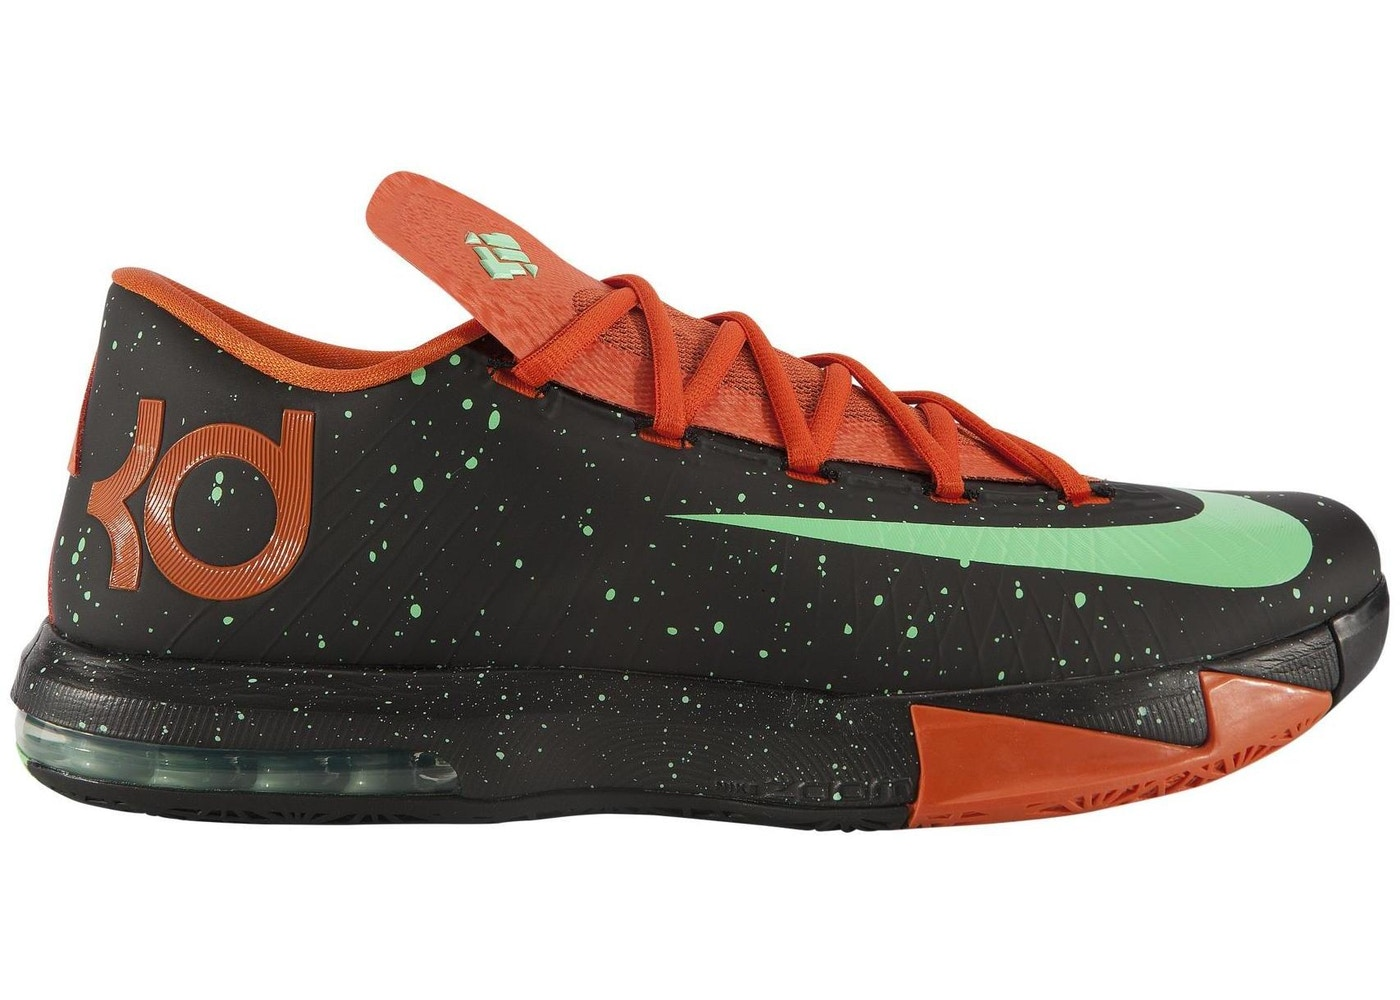 promo code 4db80 5473b Nike KD 6 Shoes - Average Sale Price